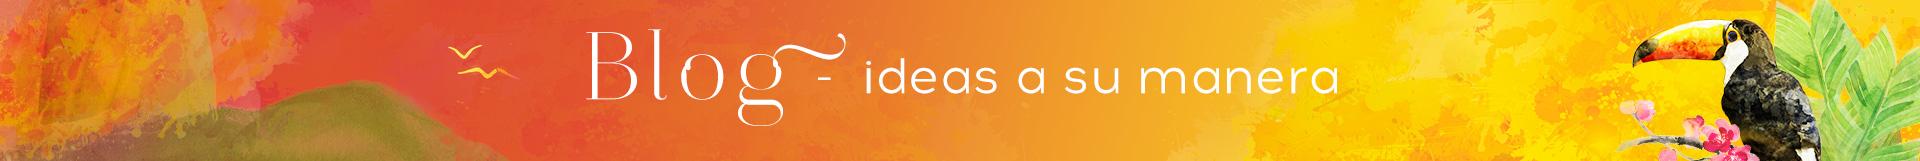 Blog – Ideas a su manera